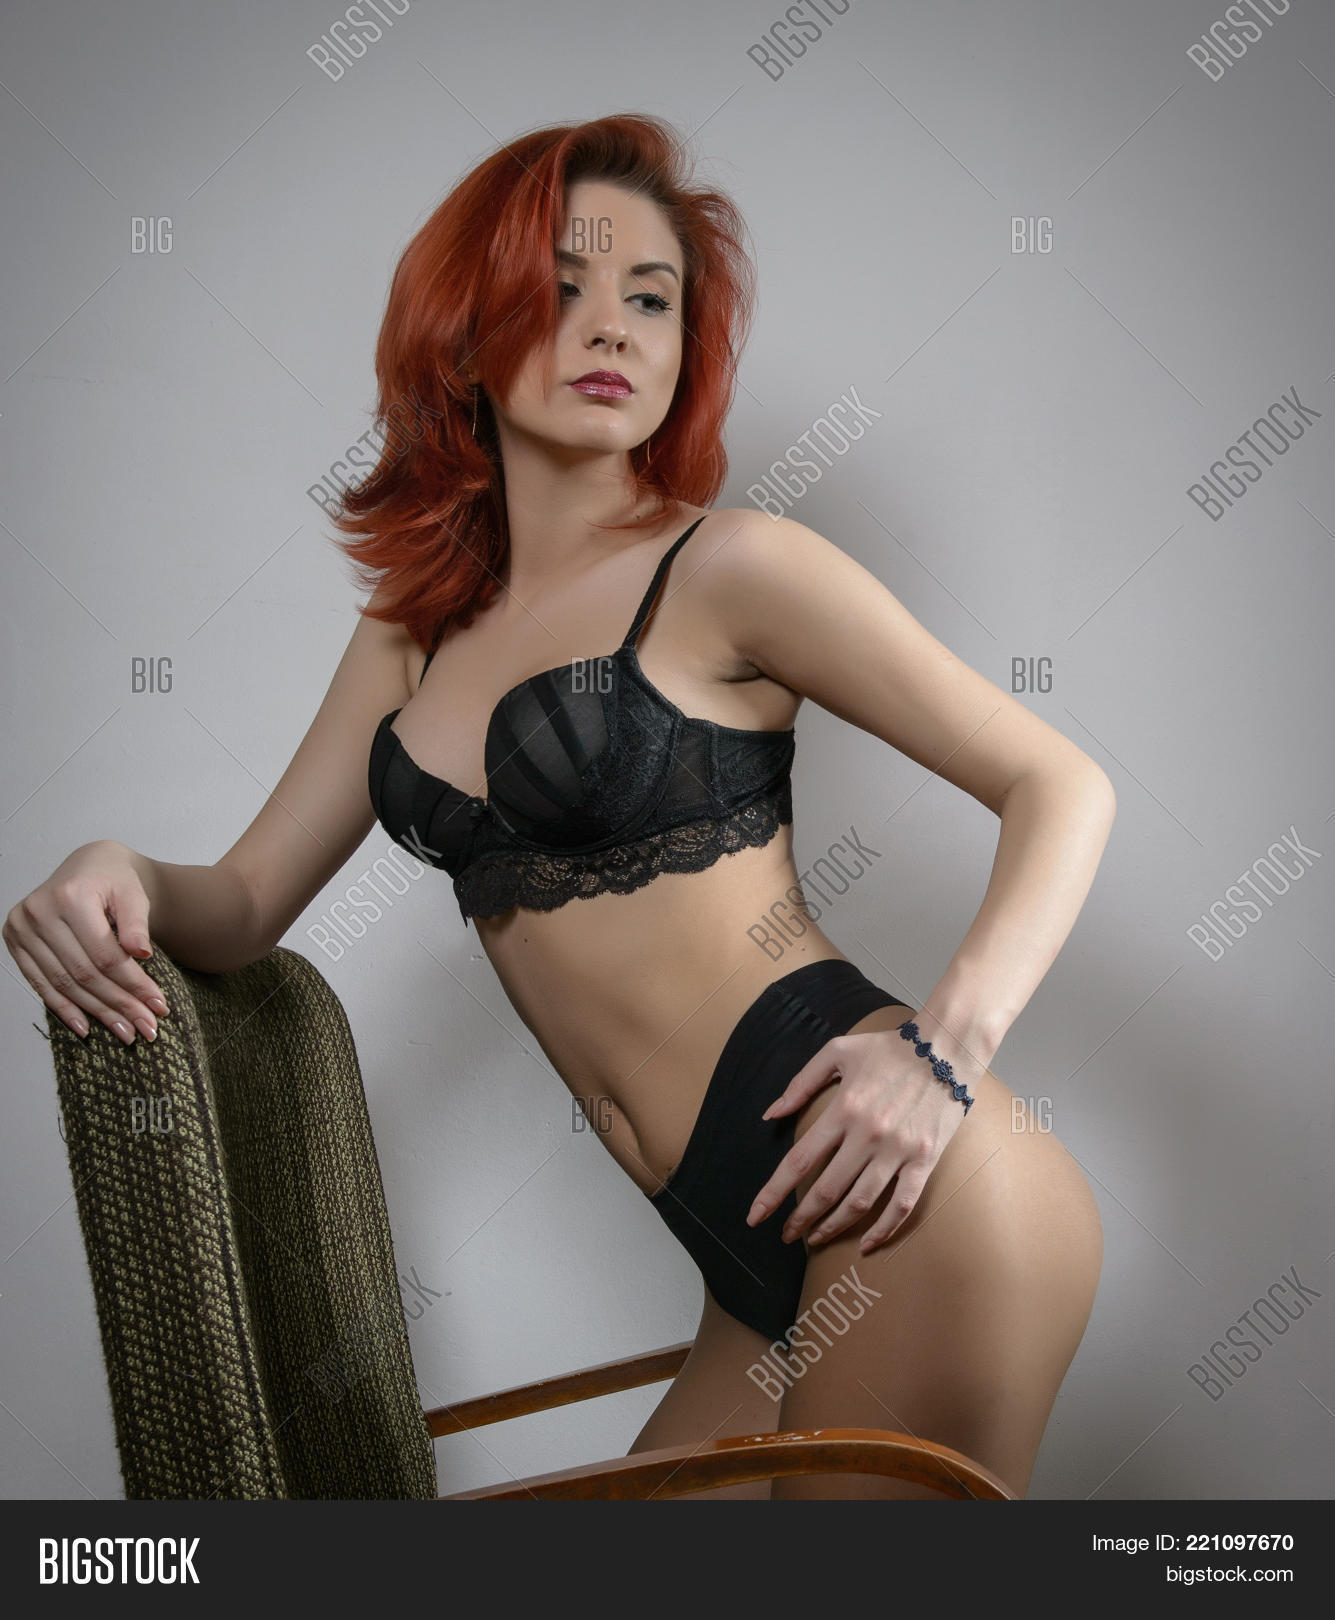 can not femdom blond dominatrix enjoy kinky foot fetish necessary phrase... super